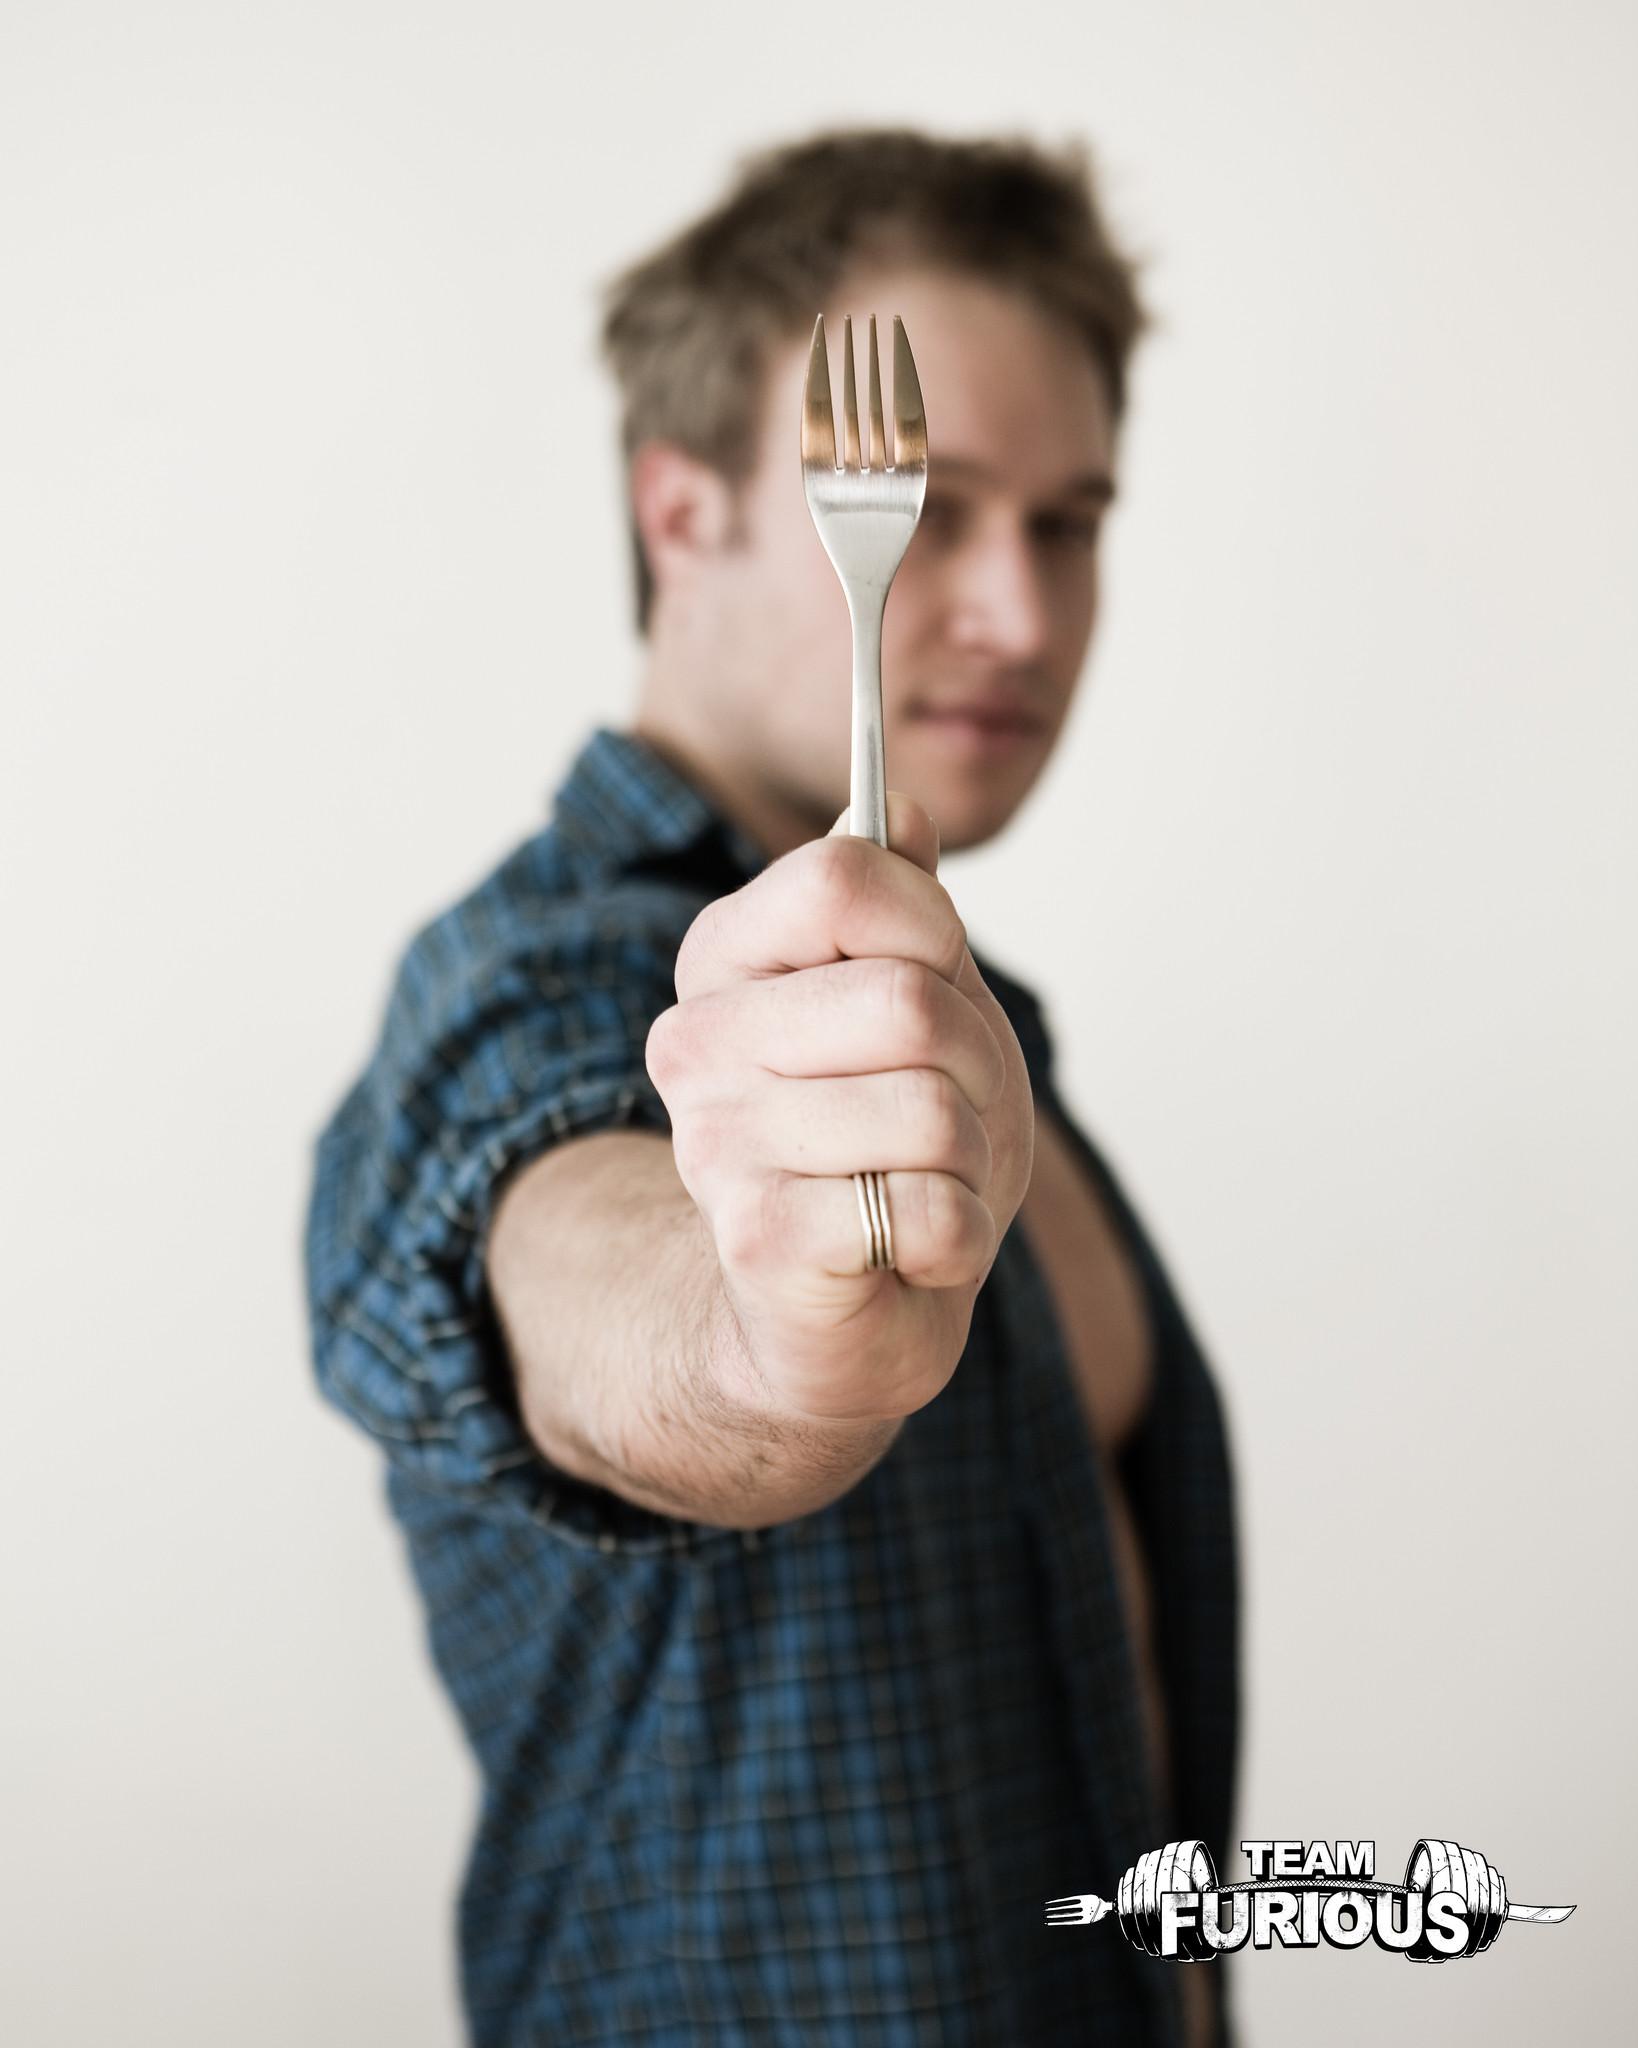 Fork_Pic_-_High_Res.jpg